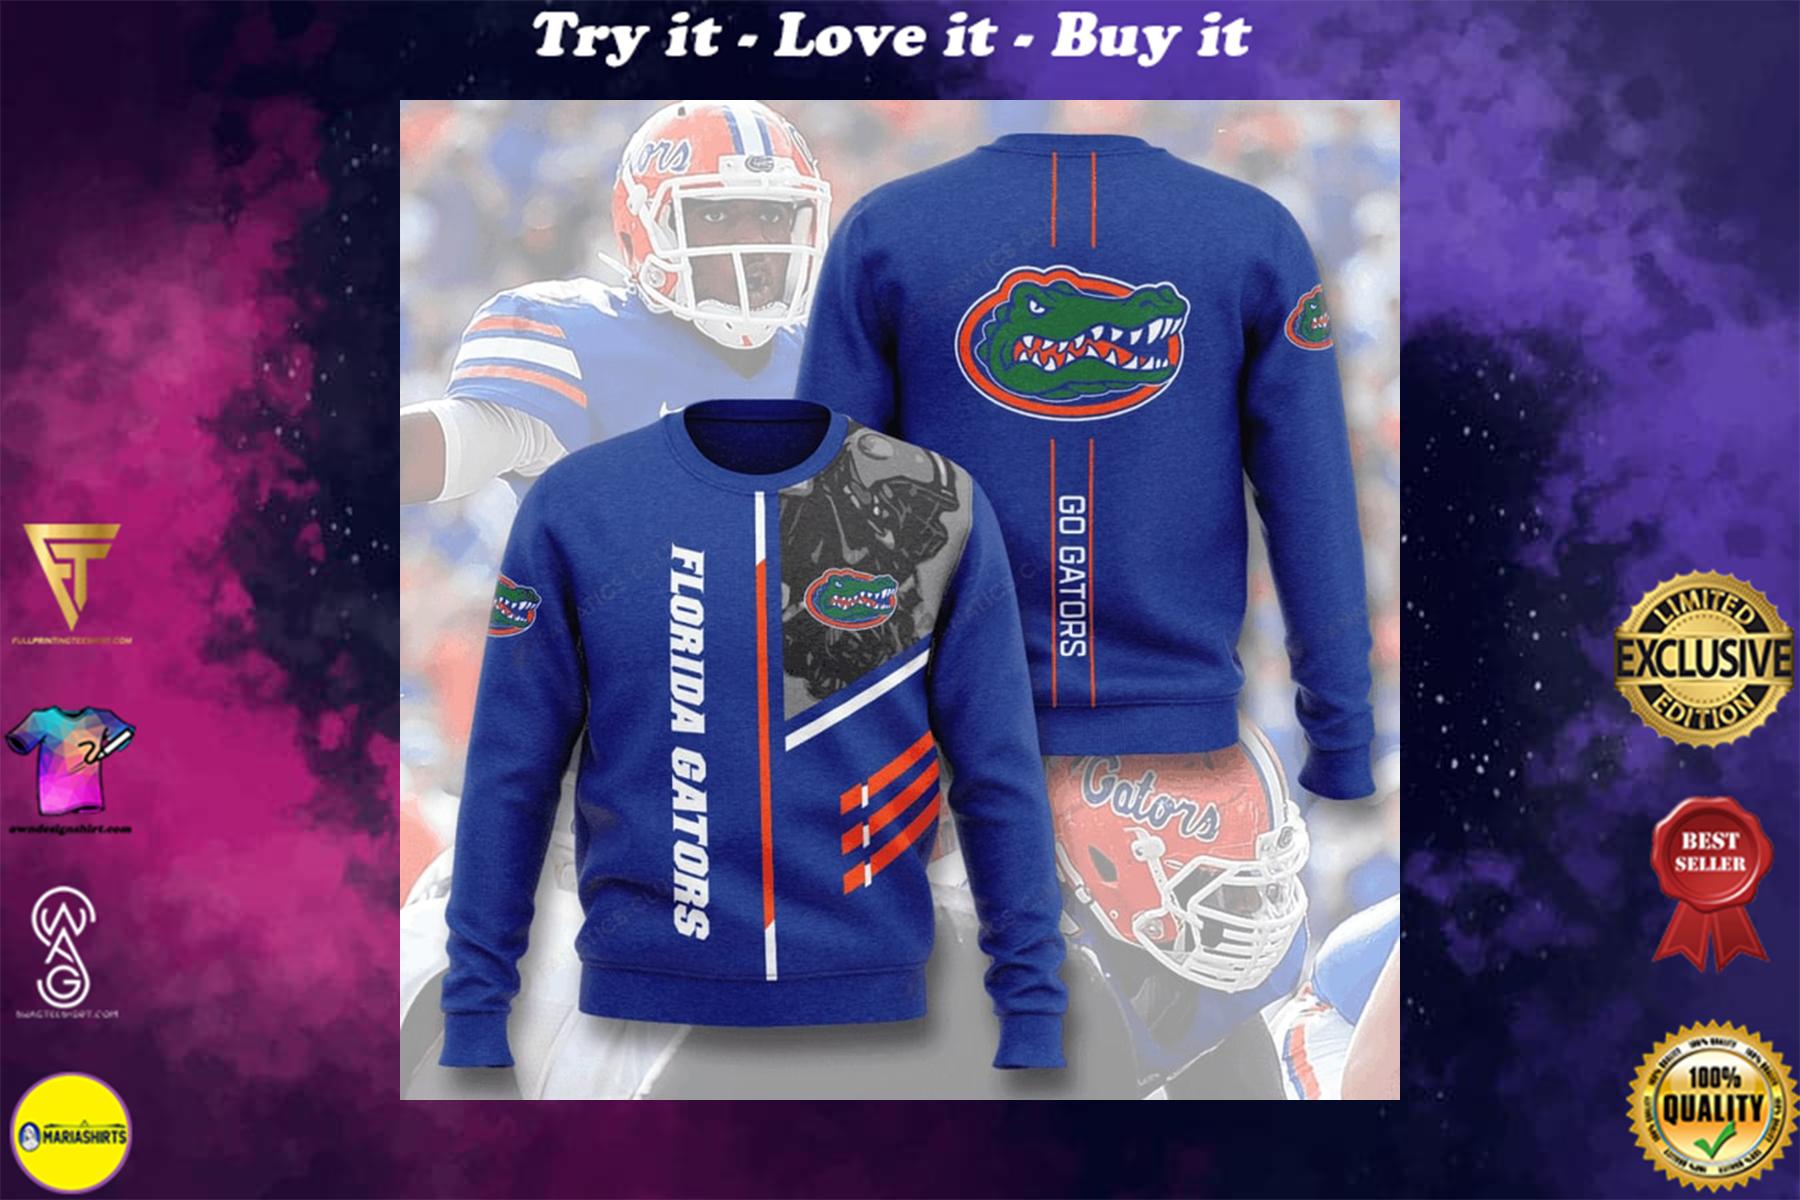 [highest selling] florida gators football go gators full printing ugly sweater - maria